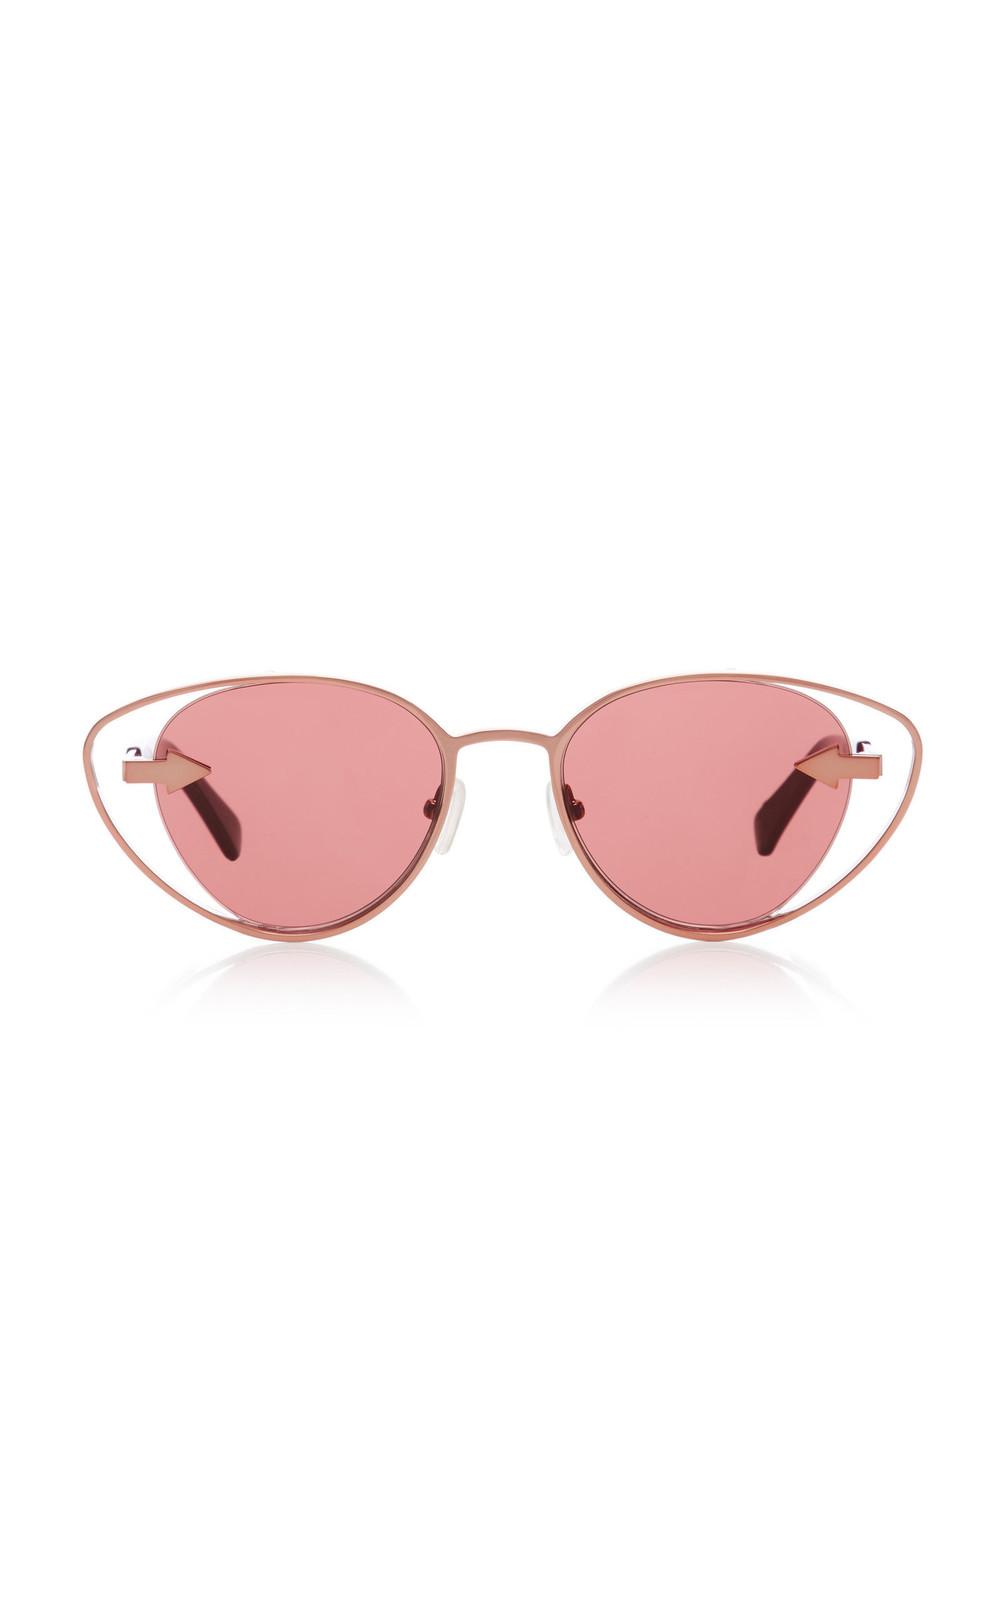 Karen Walker Kissy Kissy Cat-Eye Sunglasses in pink